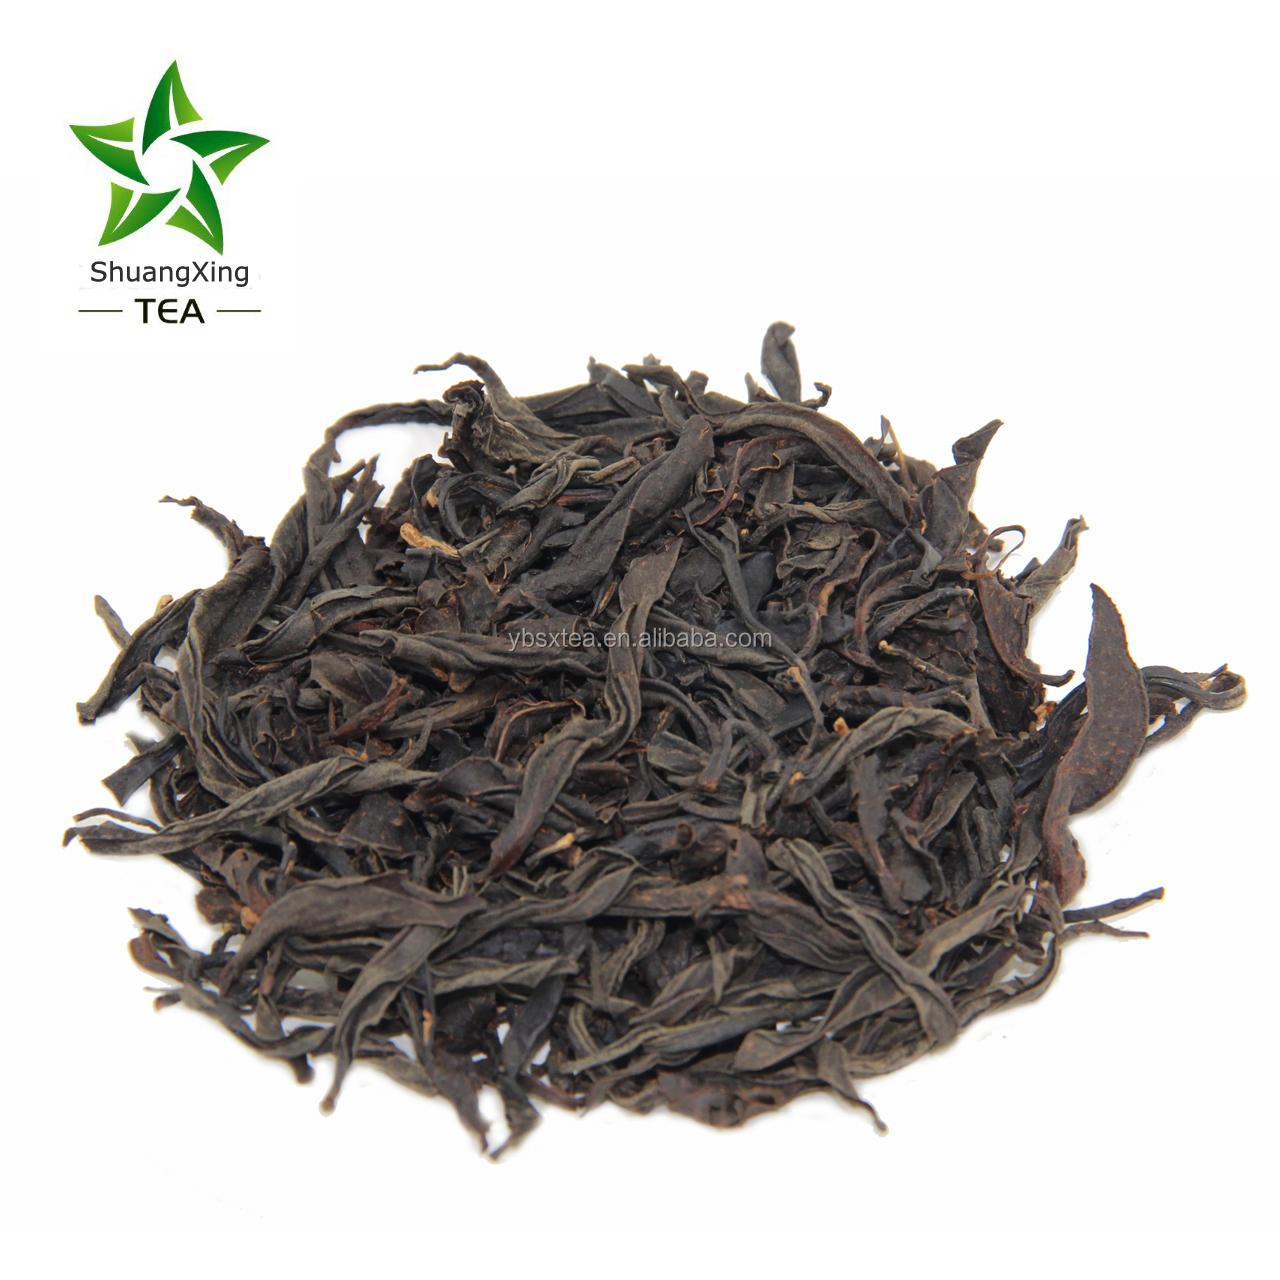 Sichuan Congou Black tea China black tea hotsale black tea cheap price